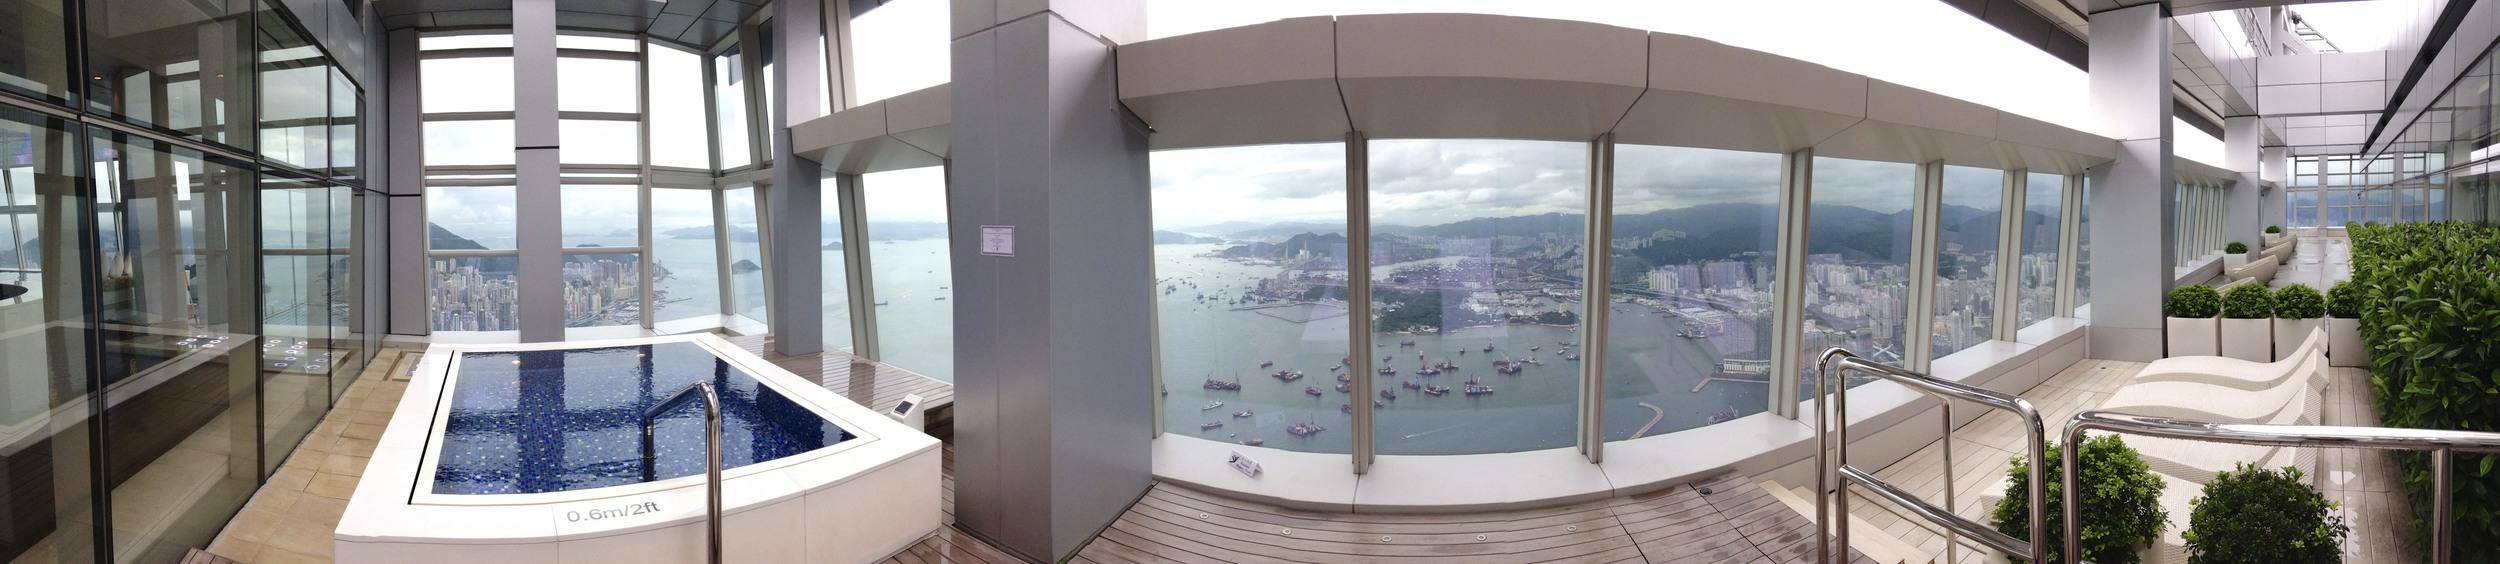 Outdoor Pool, 118th floor, Ritz-Carlton Hong Kong